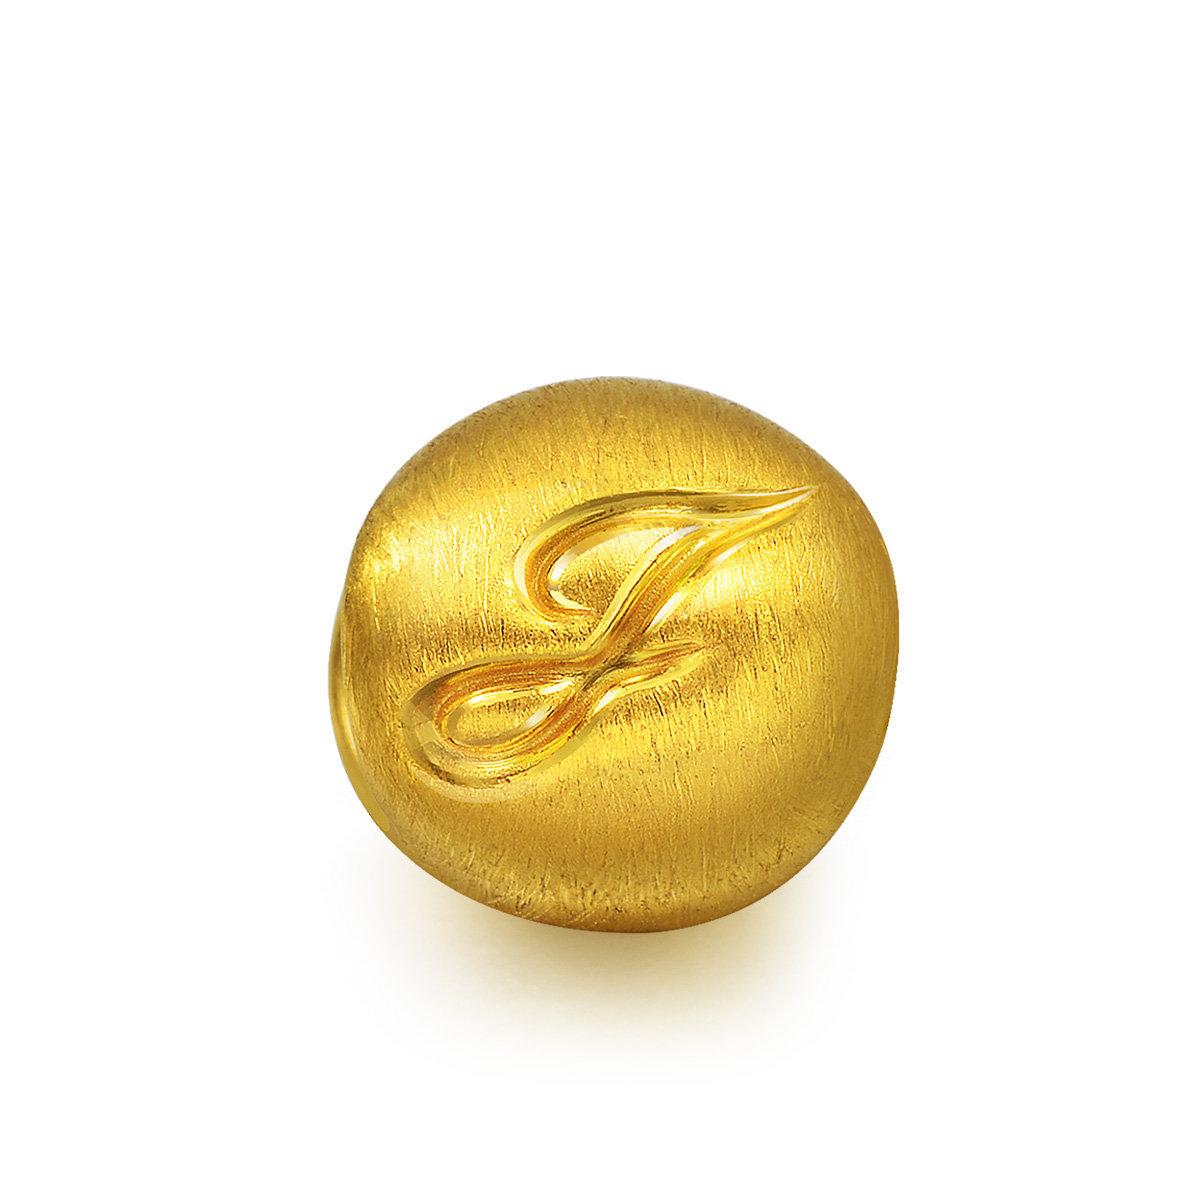 Charme 'Alphabets' 999 Gold Letter J Charm (Bracelet not included)